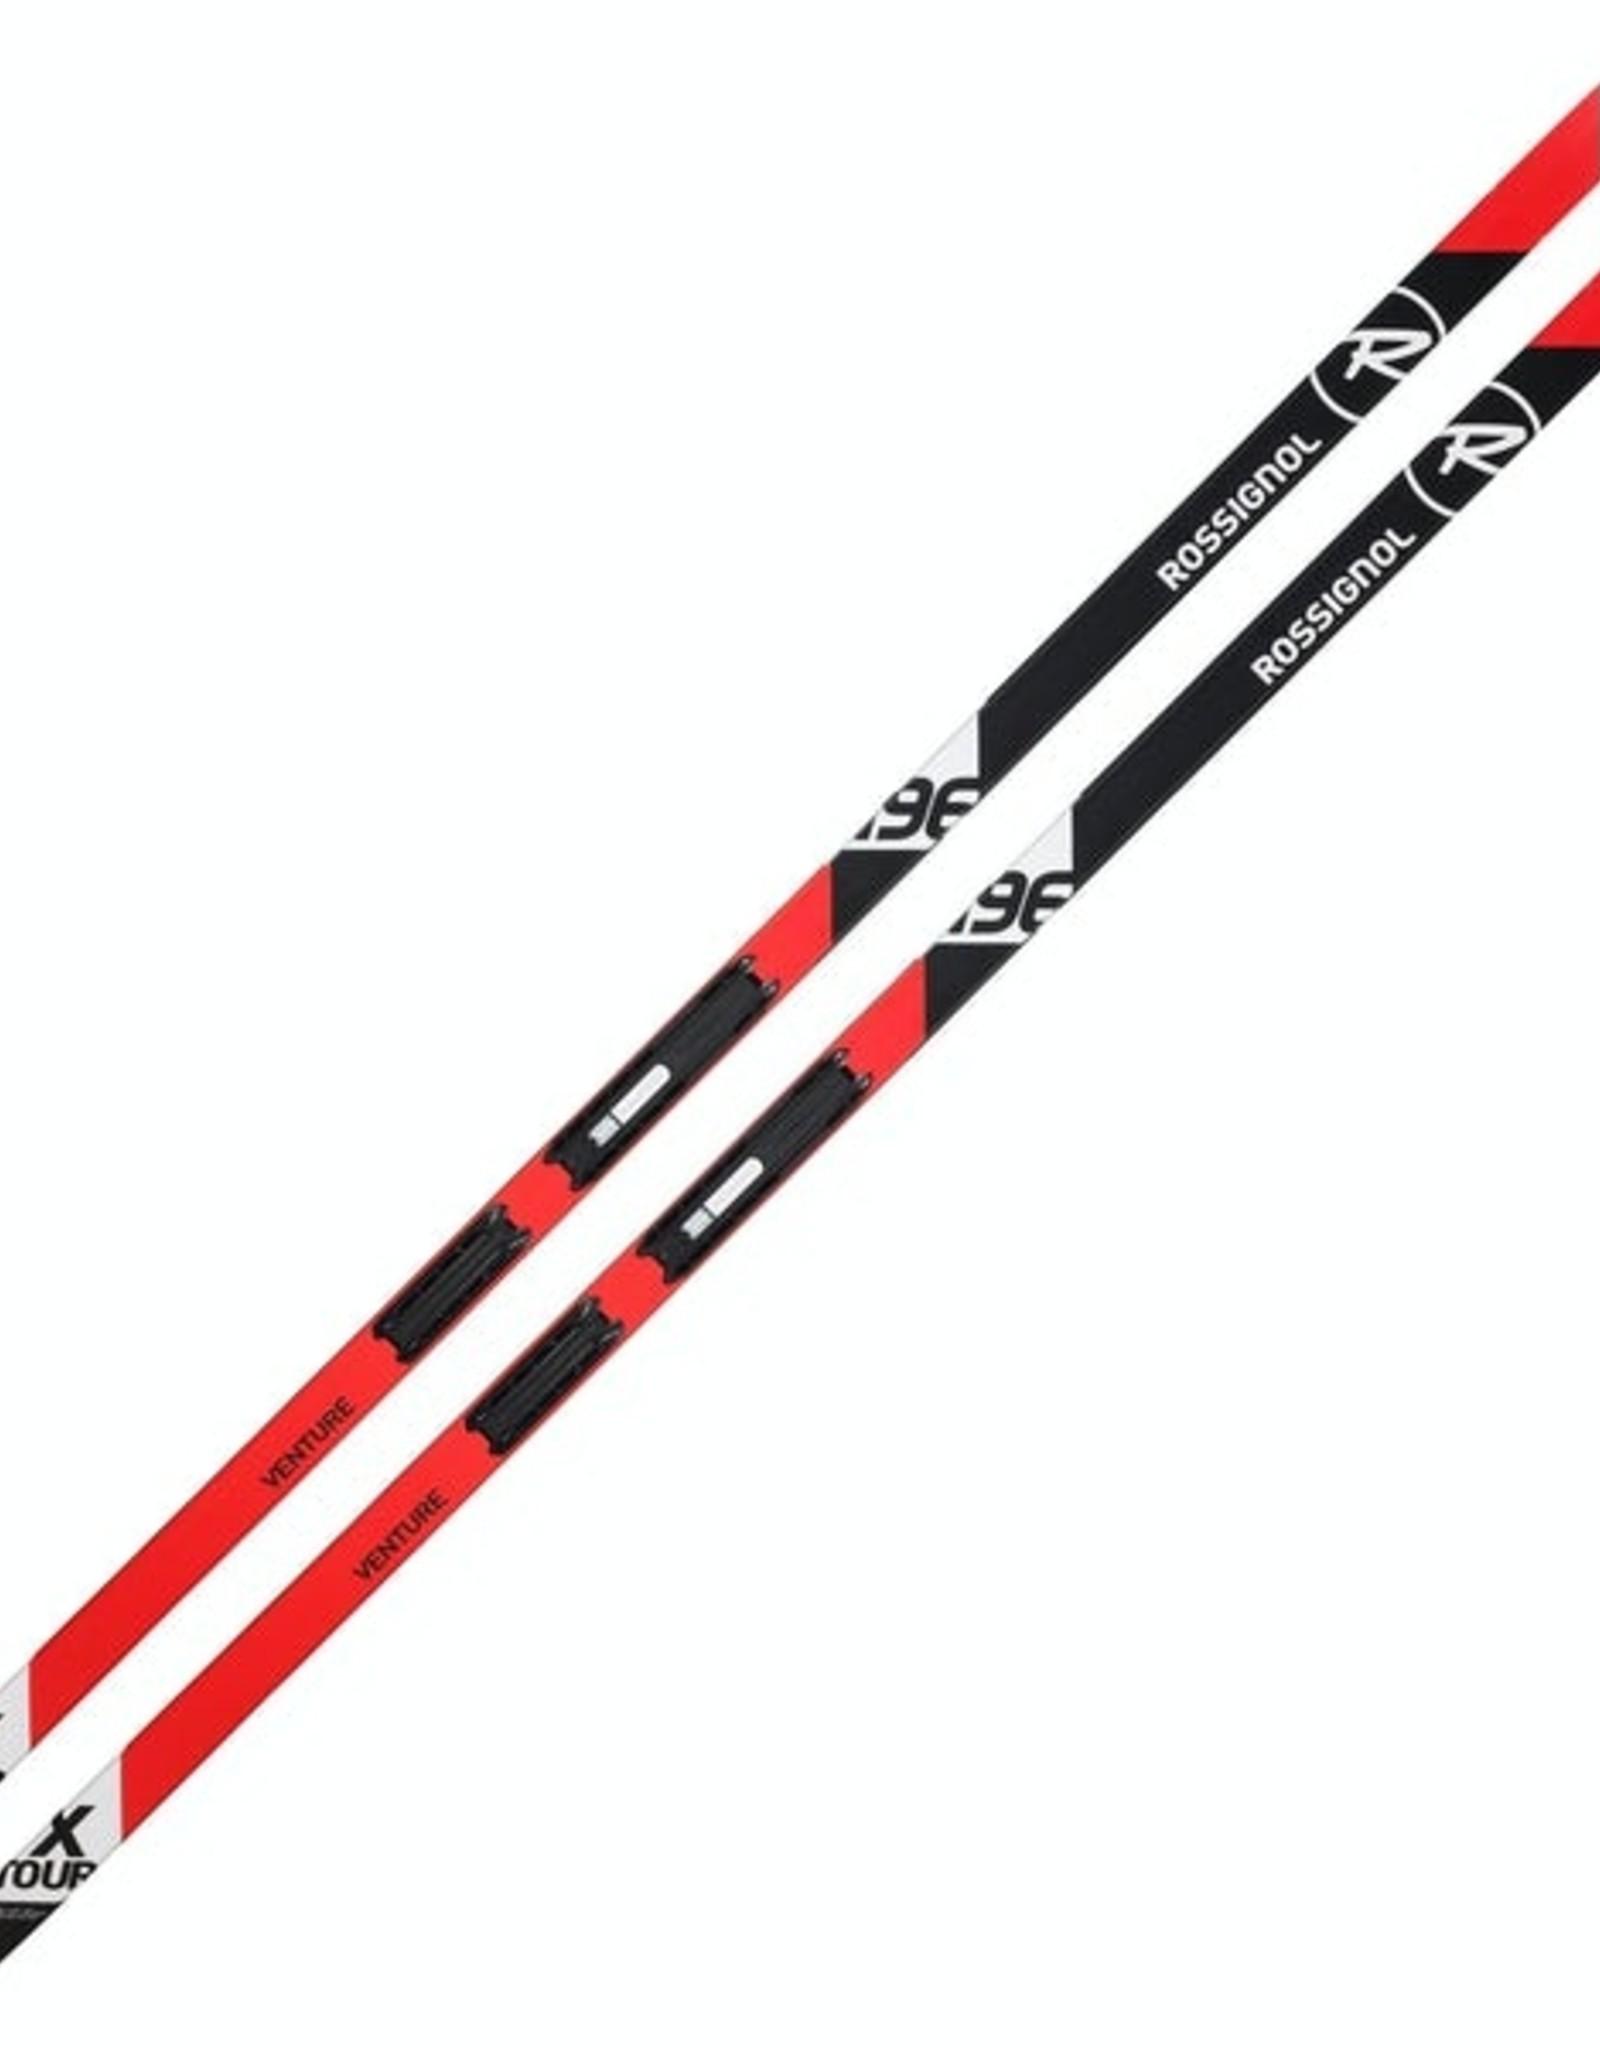 Rossignol Ski de Fond Rossignol X-Tour Venture Sr